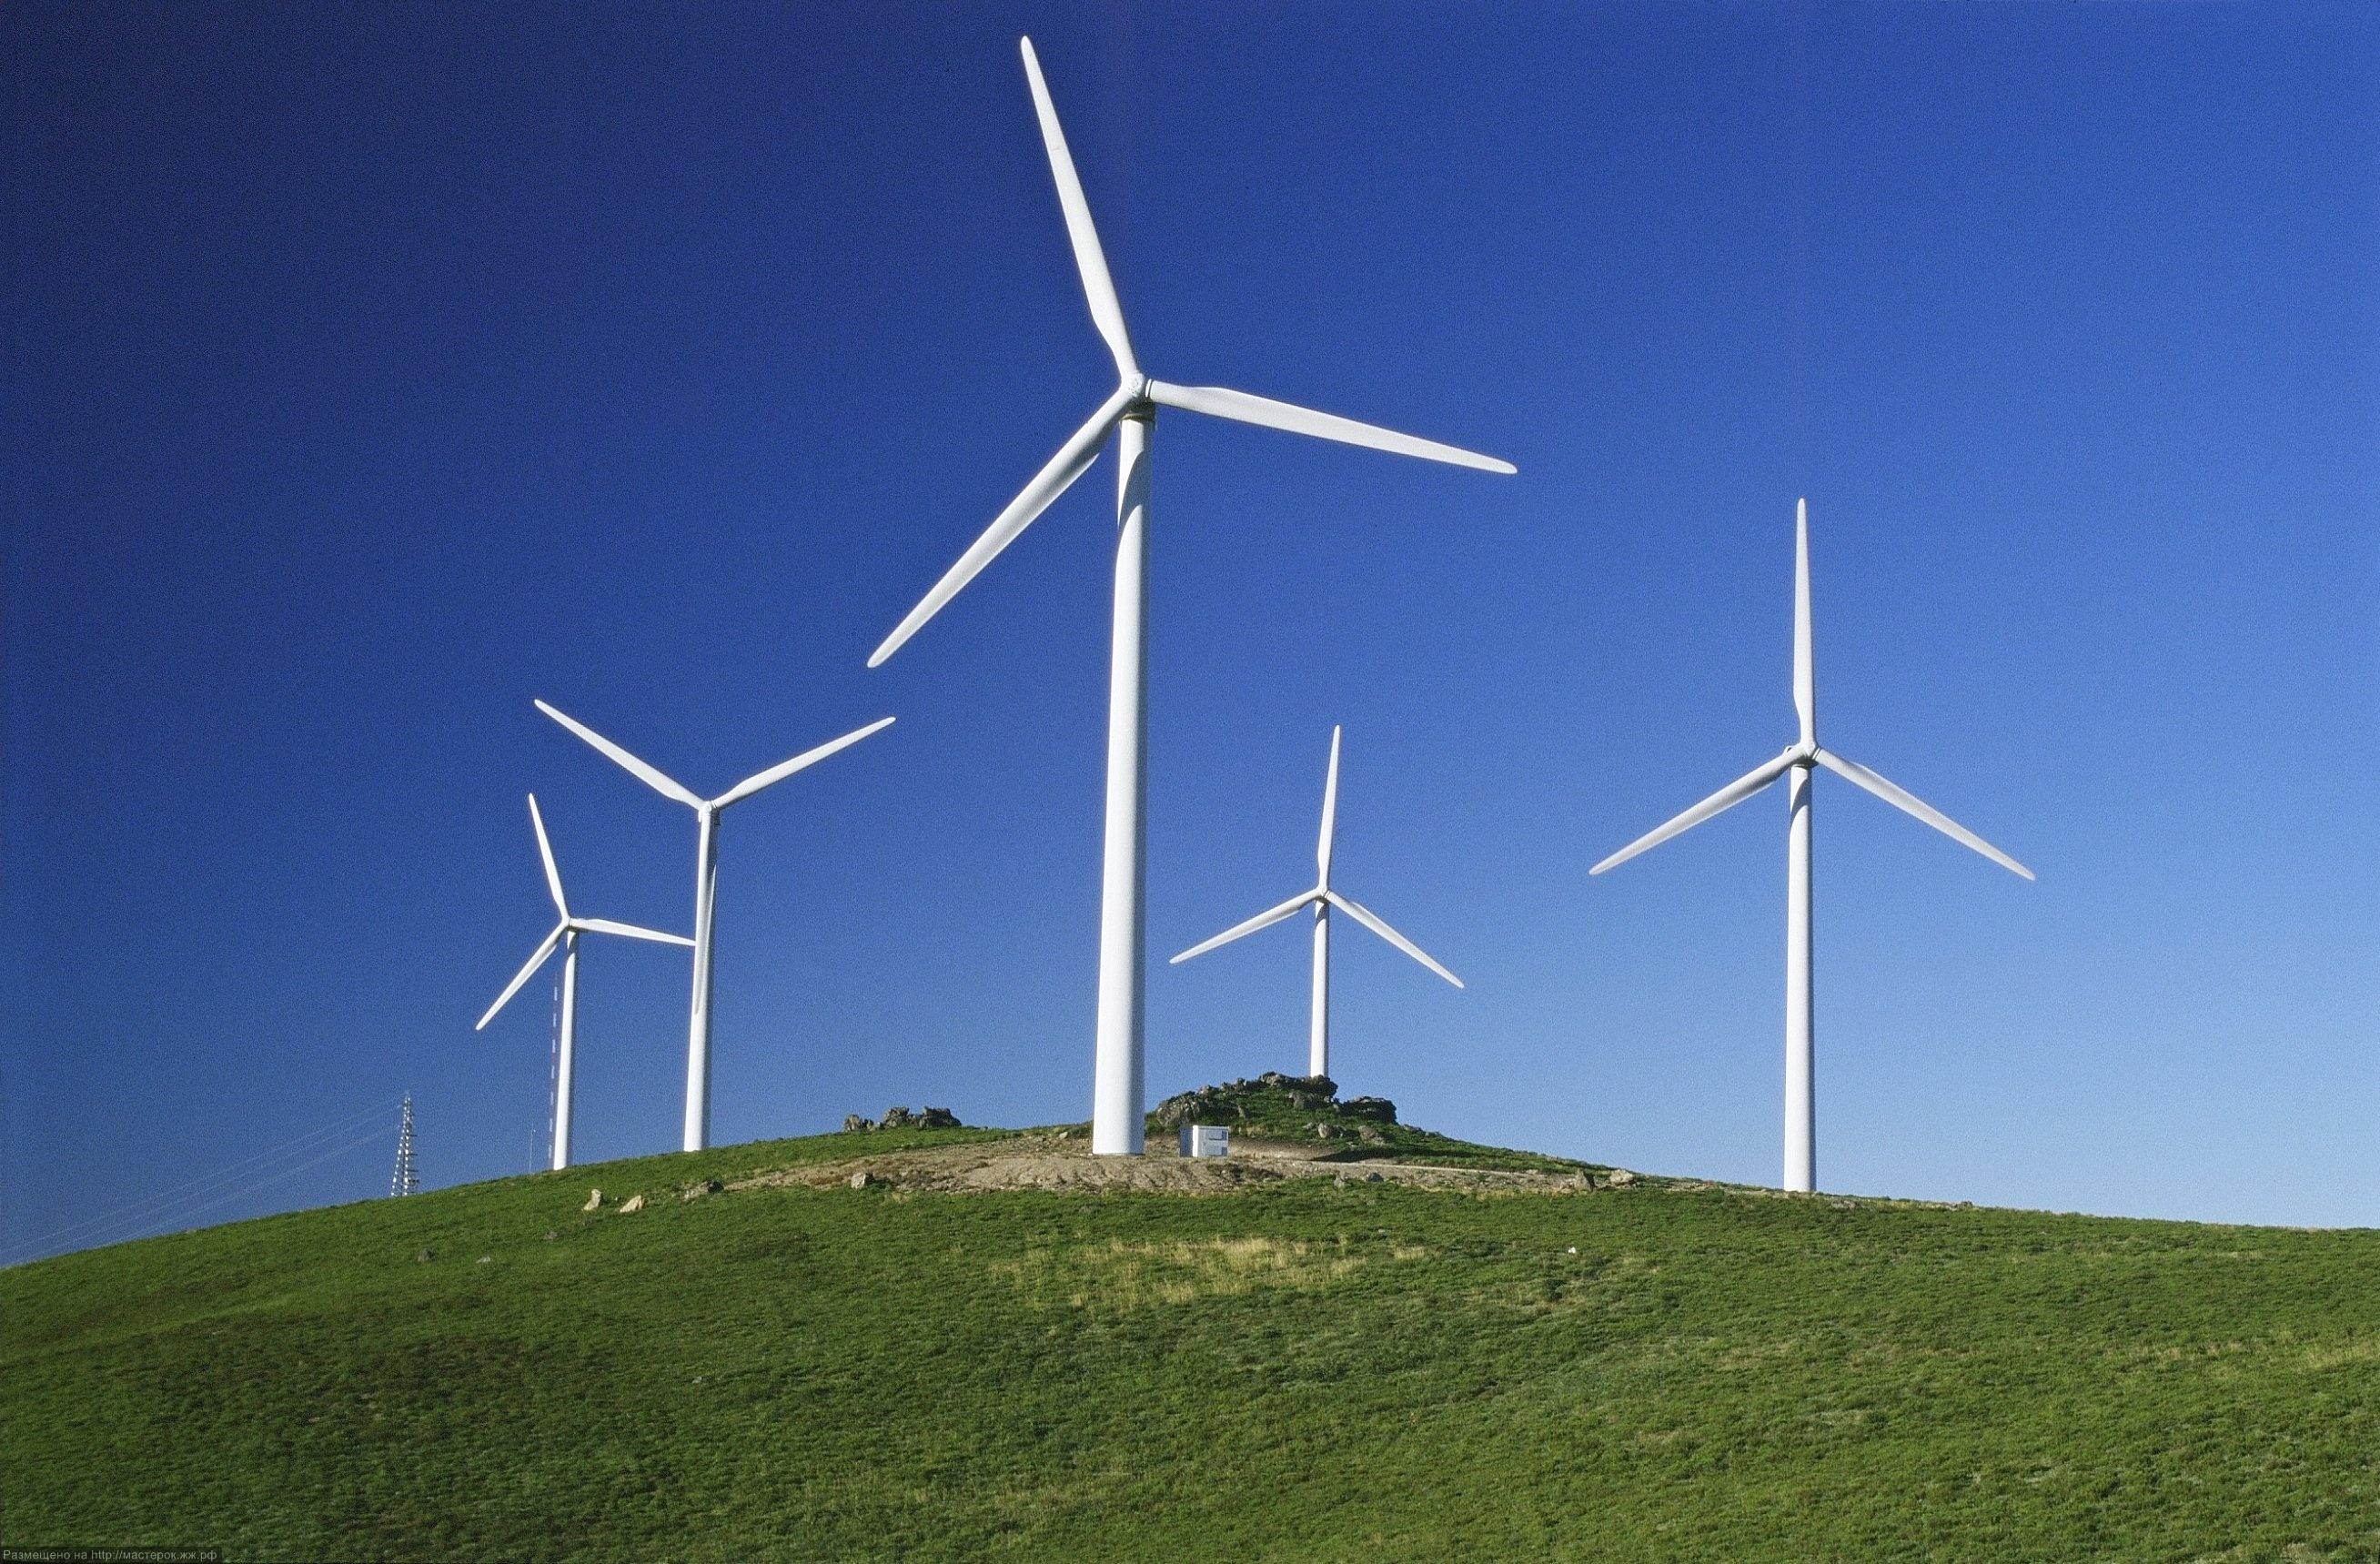 Плюсы и минусы ветровых электростанций | плюсы и минусы